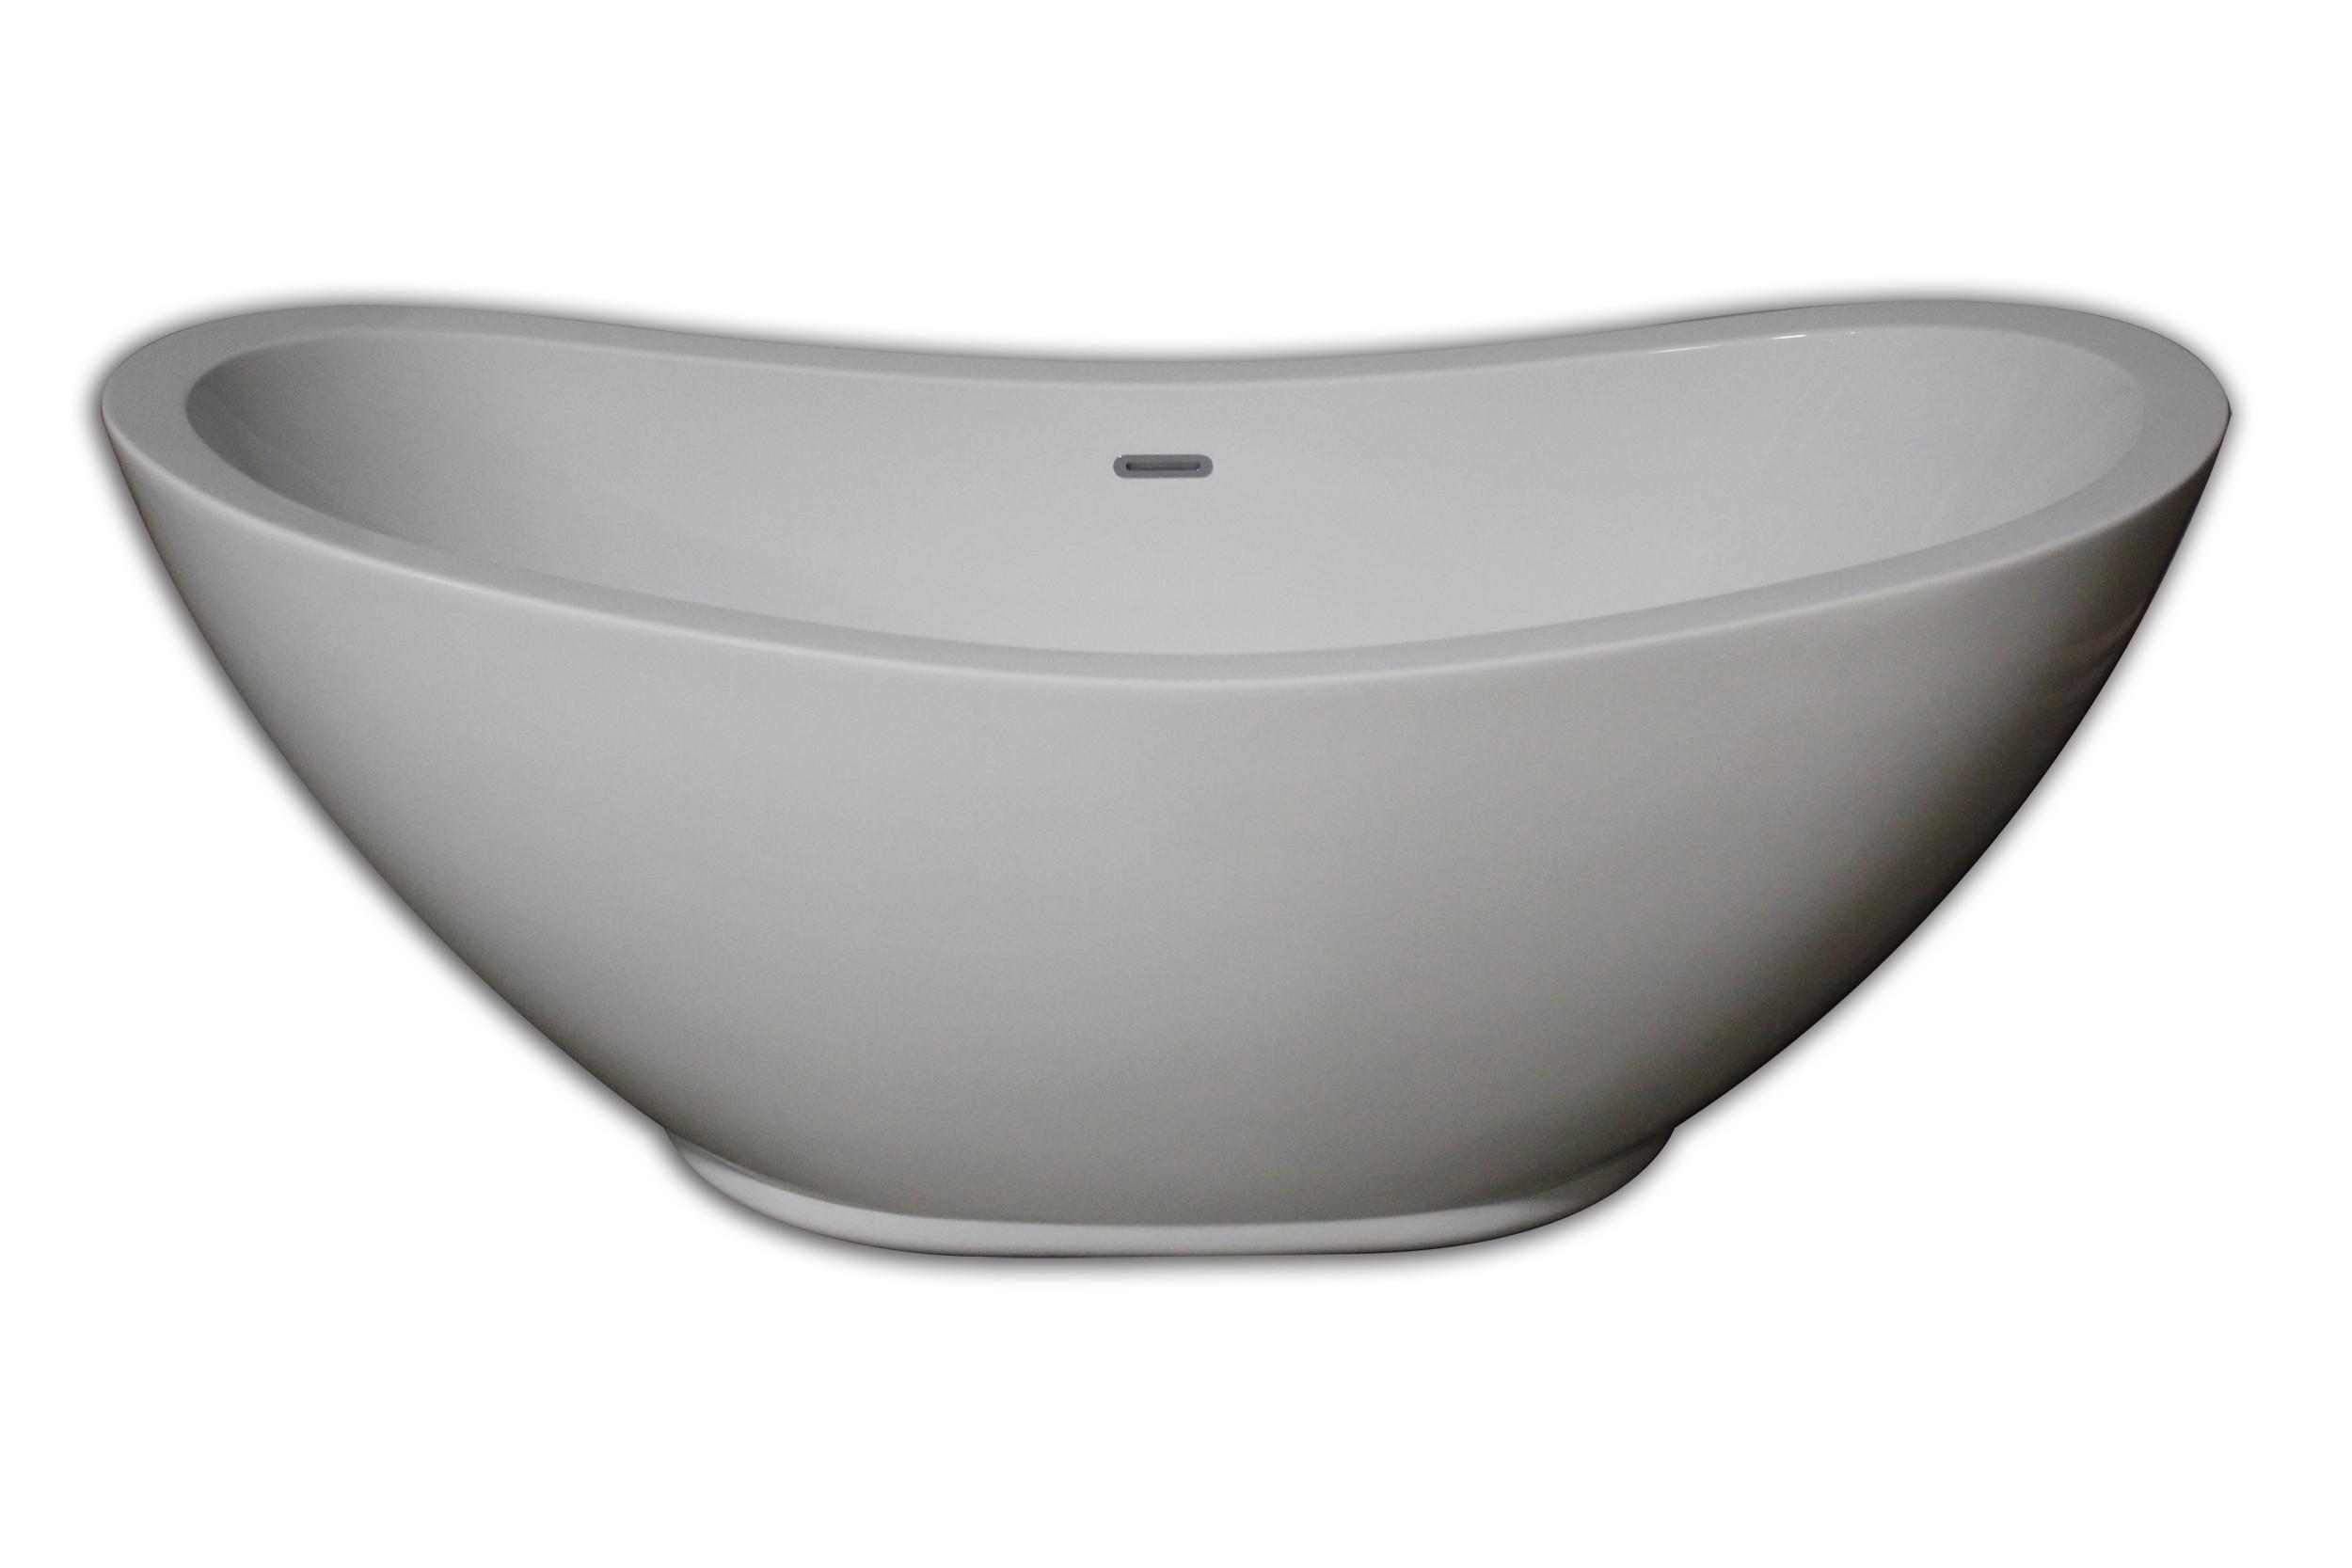 Cambridge AFDES Light Weight Acrylic Freestanding Double Slipper Bathtub